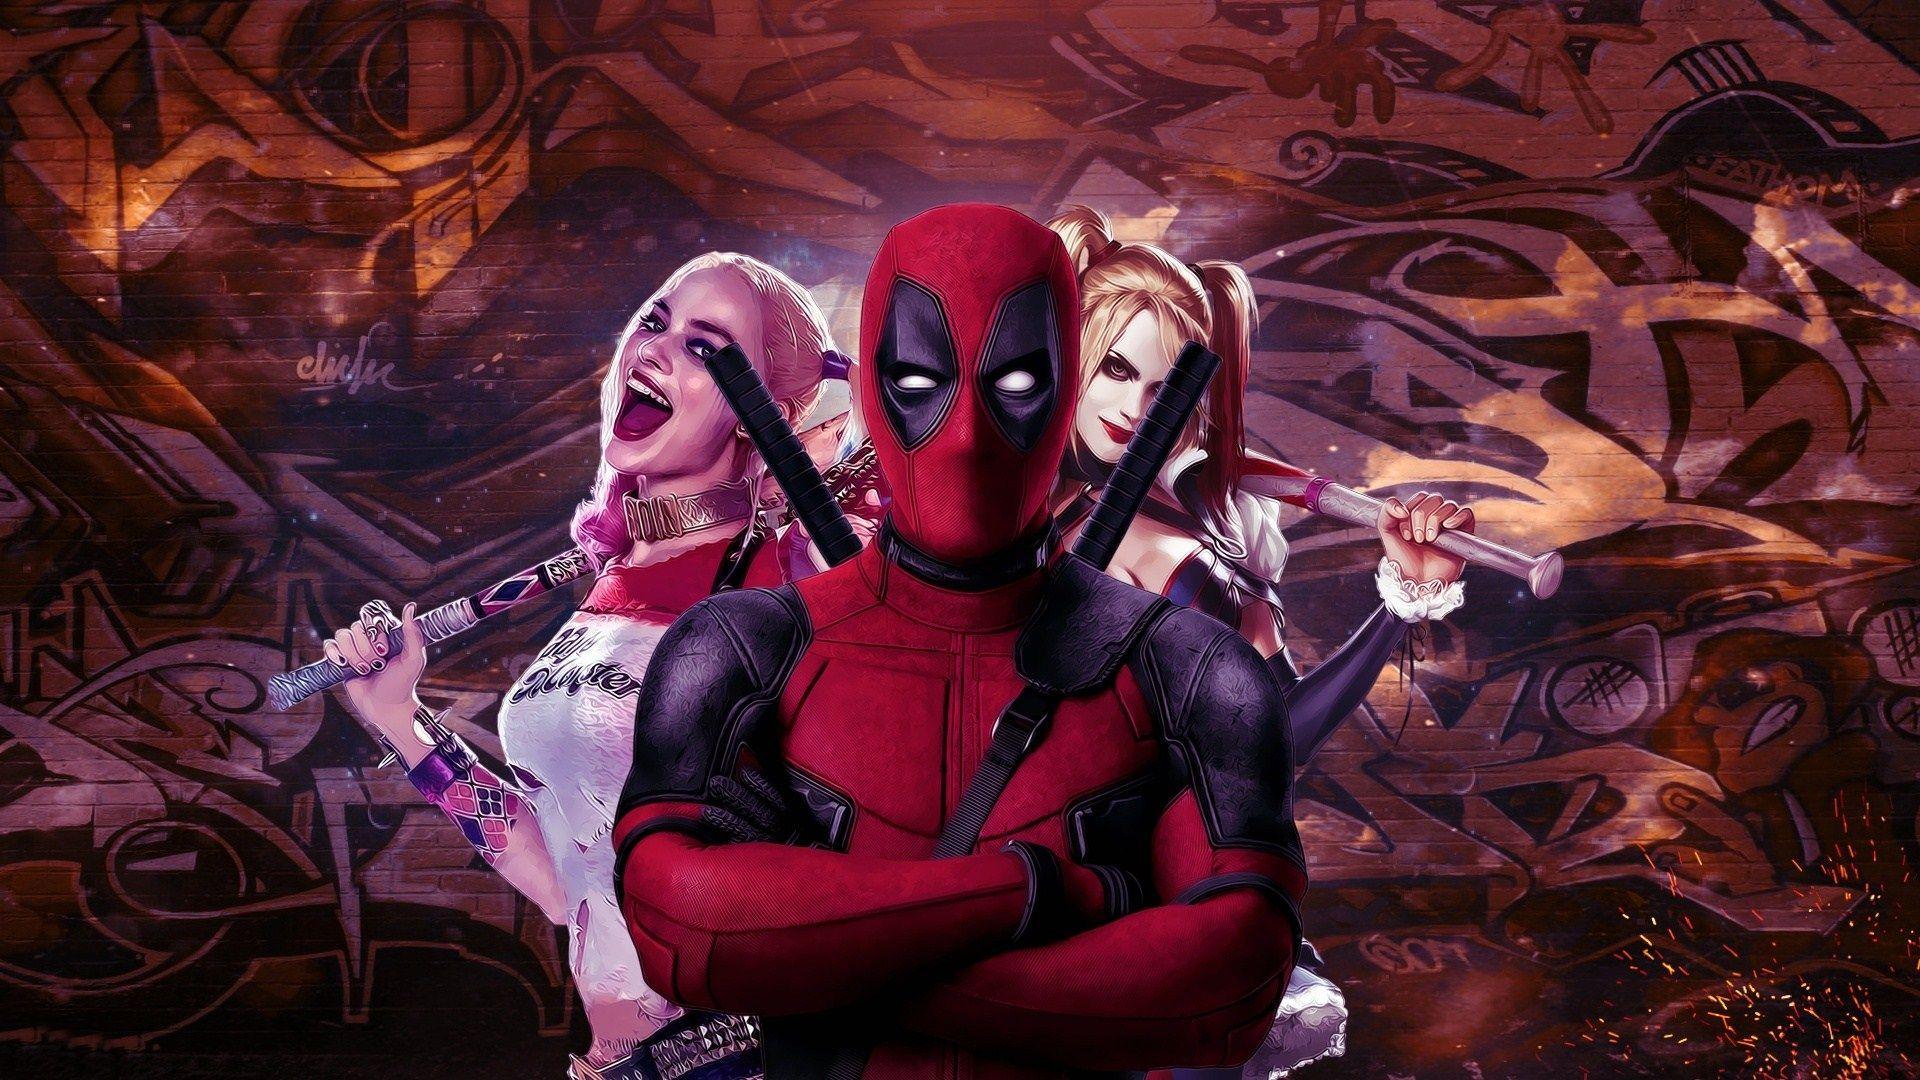 Deadpool 2 Wallpapers Top Free Deadpool 2 Backgrounds